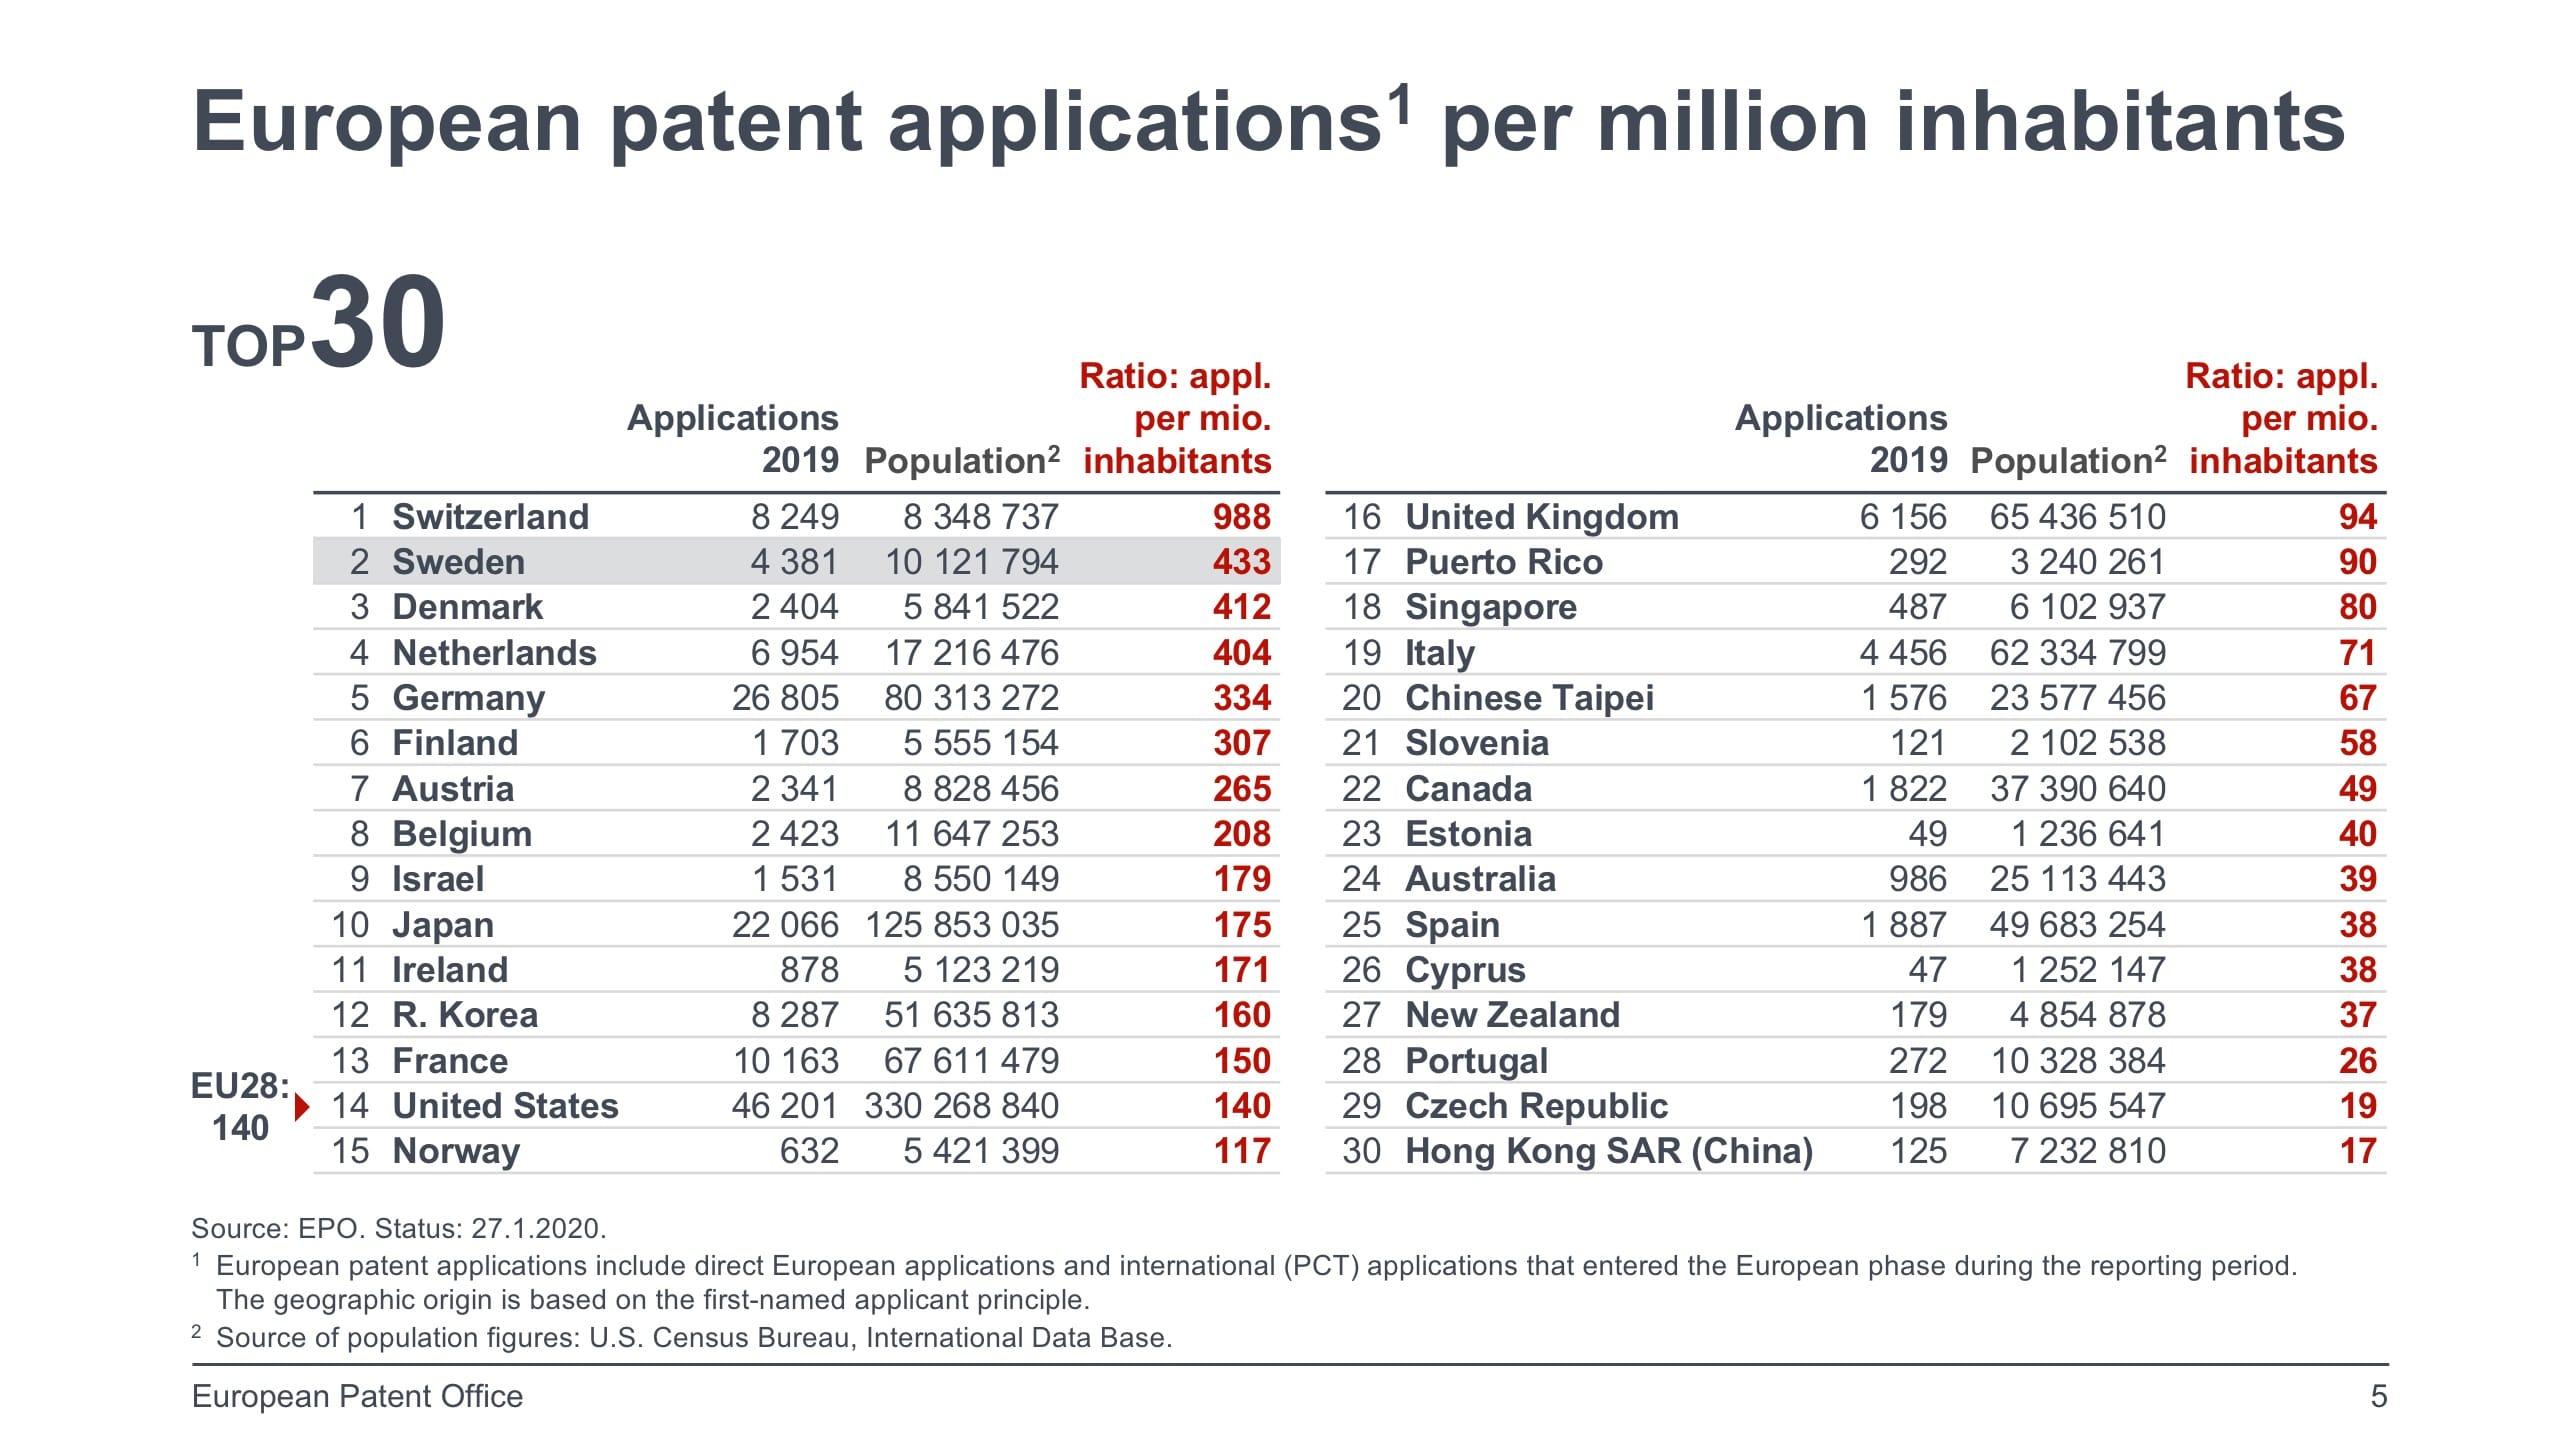 Antal patentansökningar per capita 2019